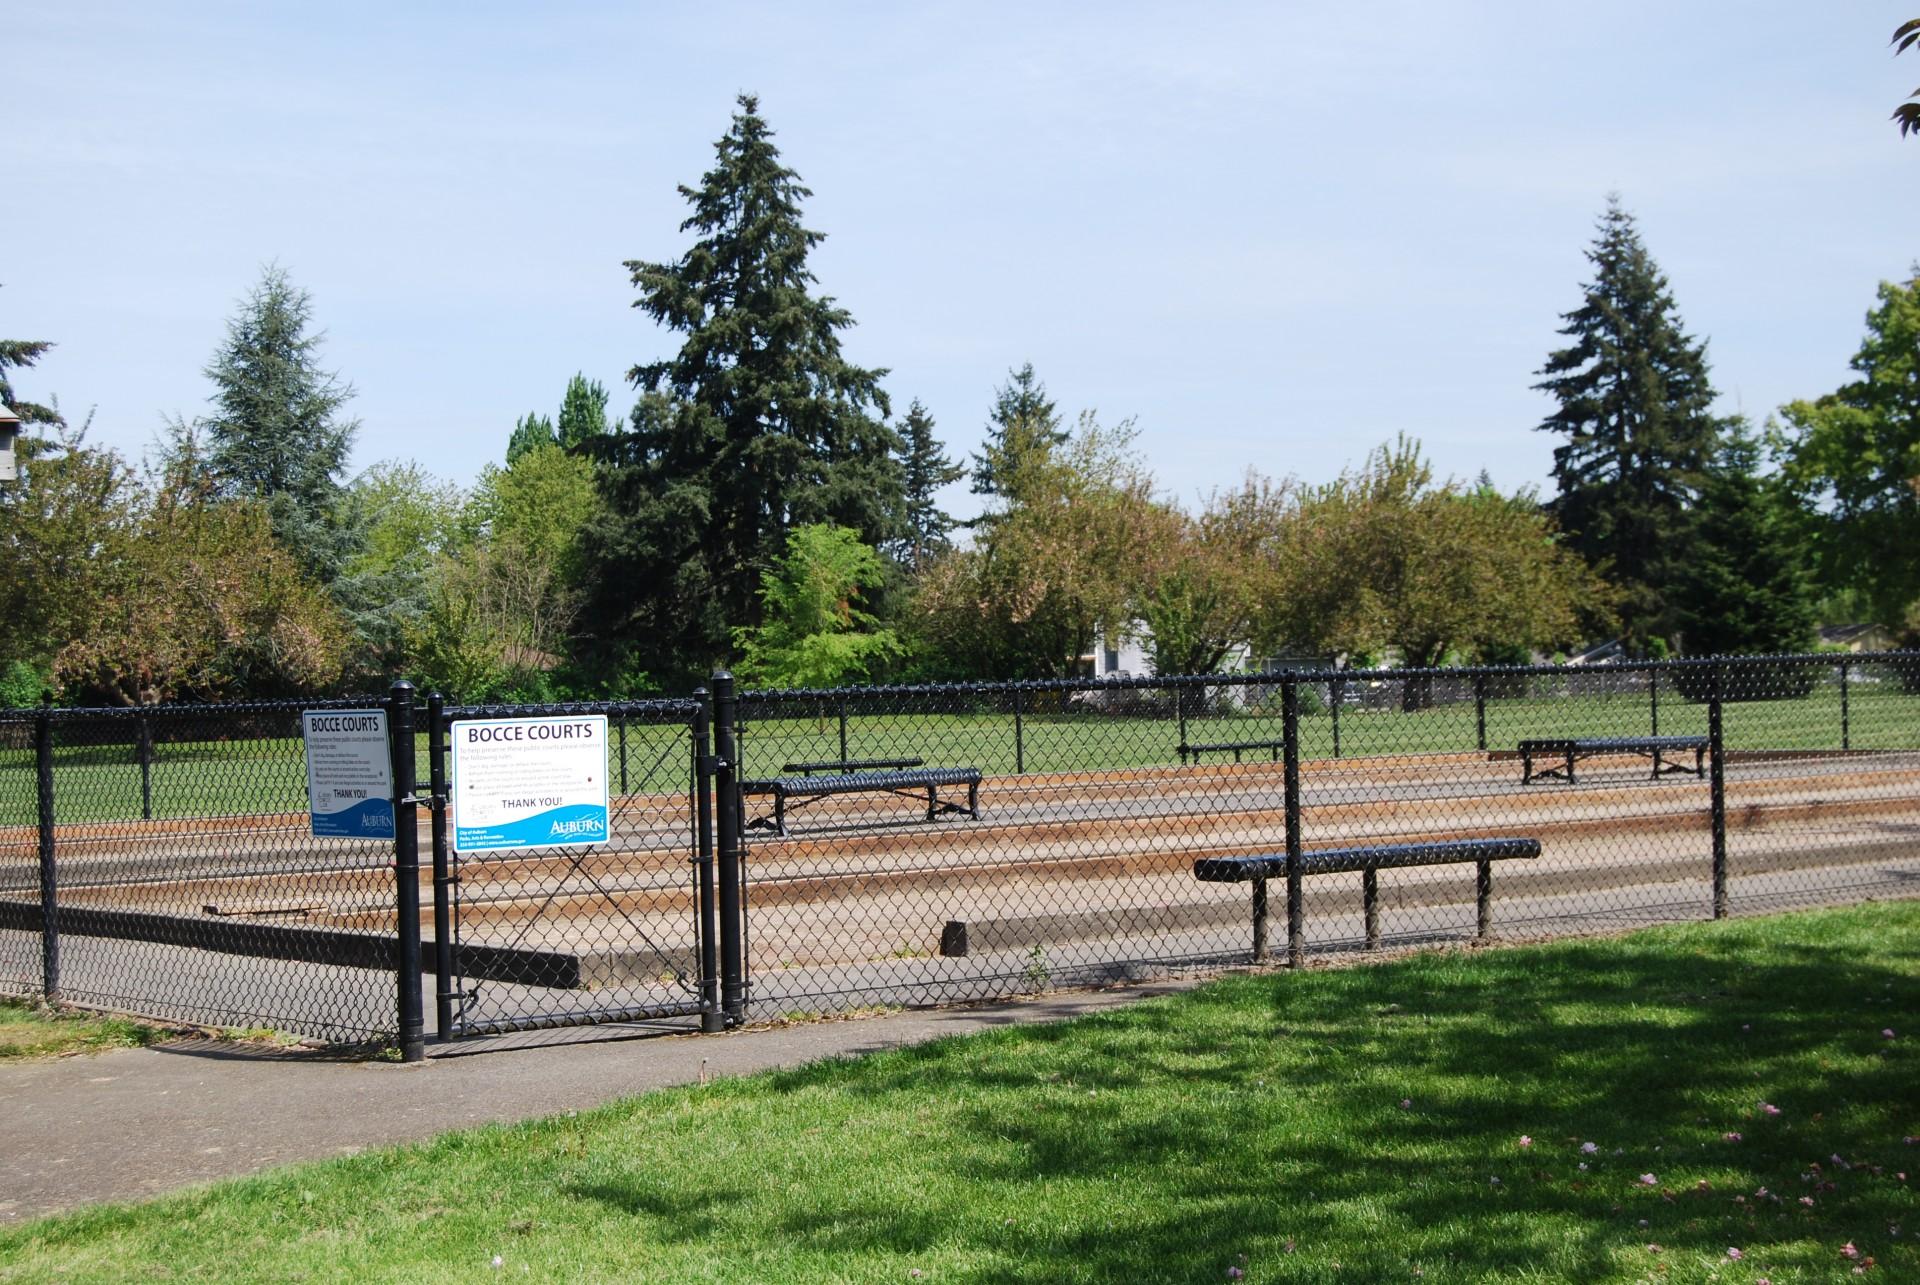 Bocce Courts at Les Gove Park